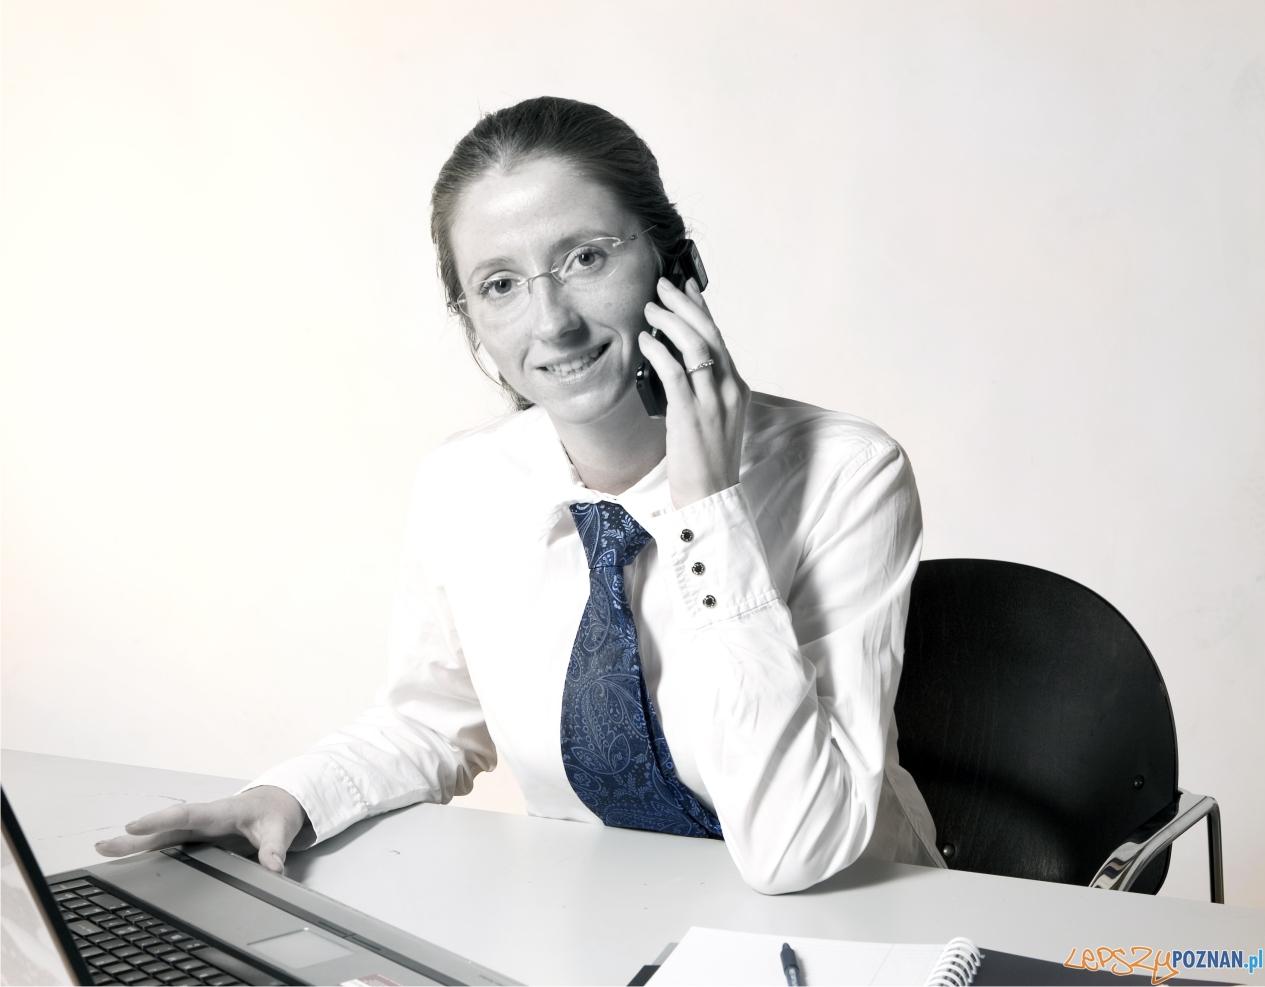 foto: scx - kobieta w biurze  Foto: